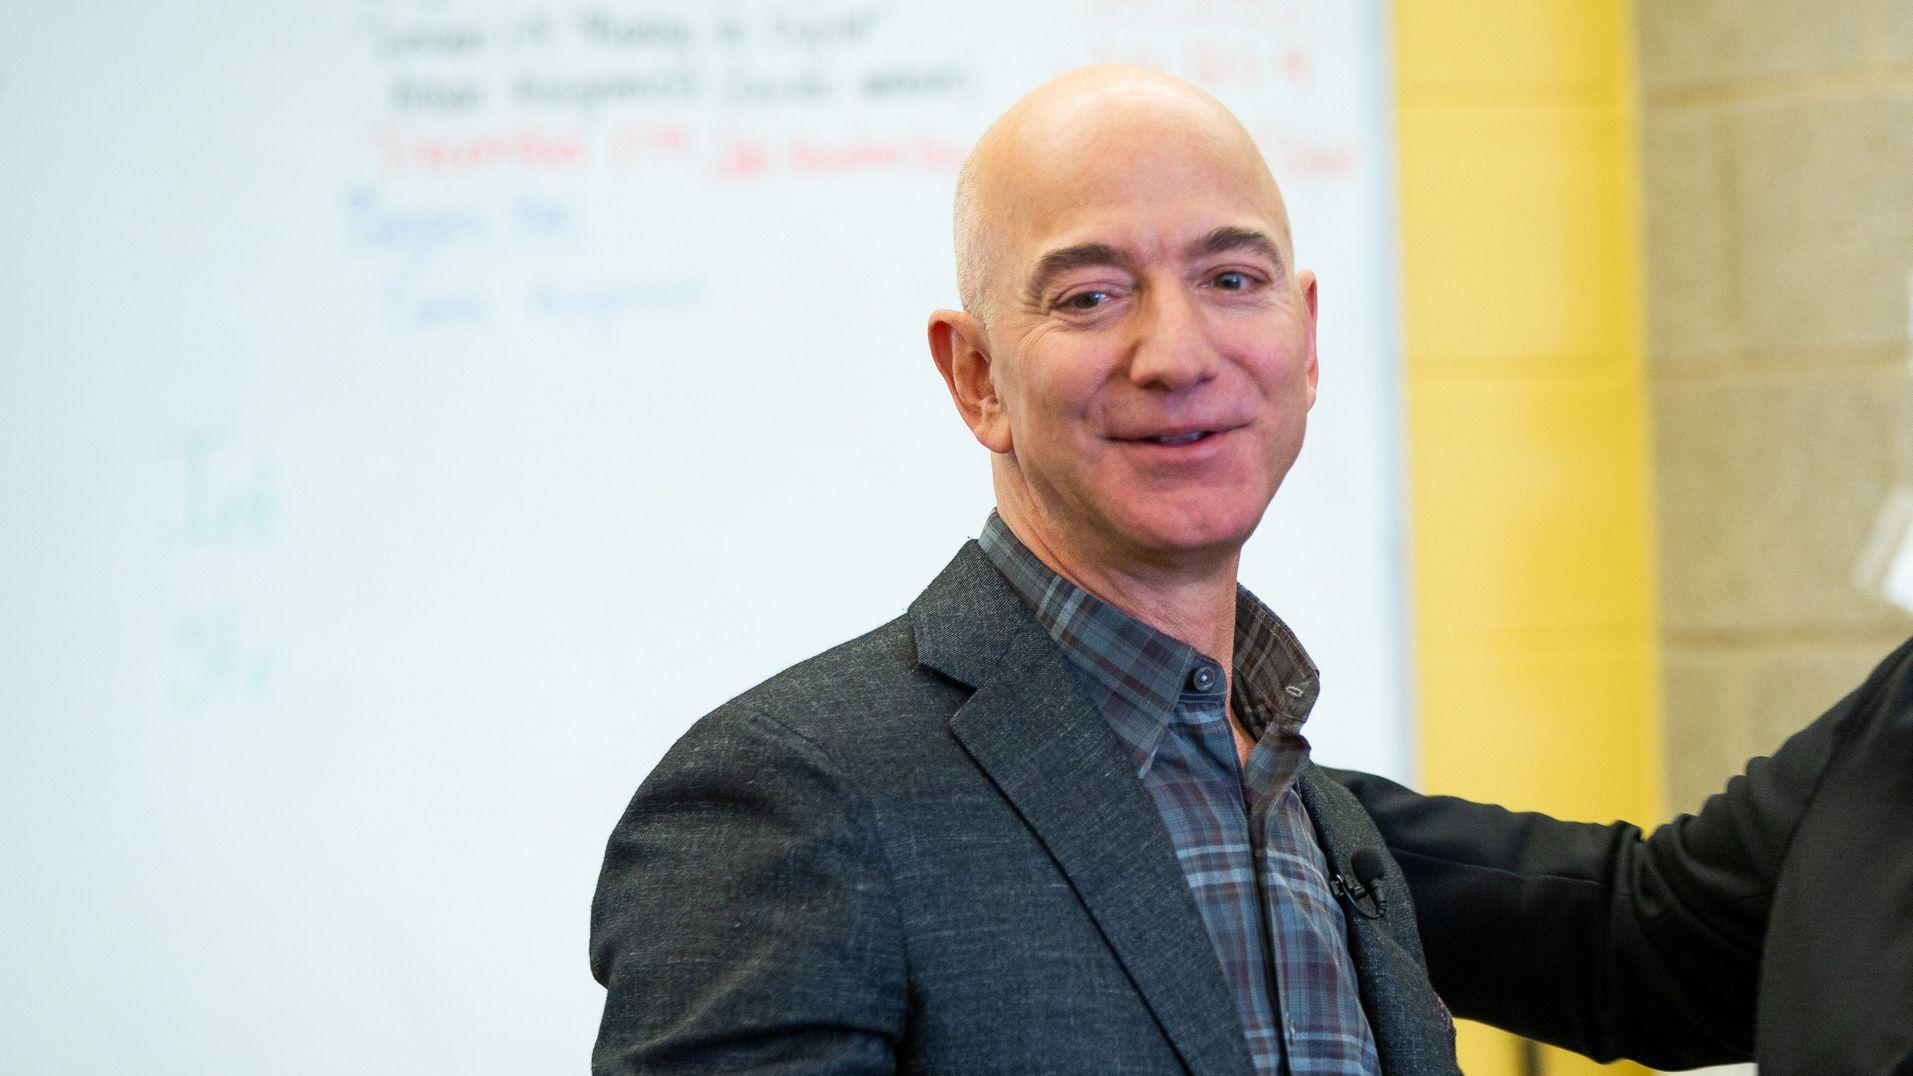 Bezos takes reigns at Amazon amid coronavirus